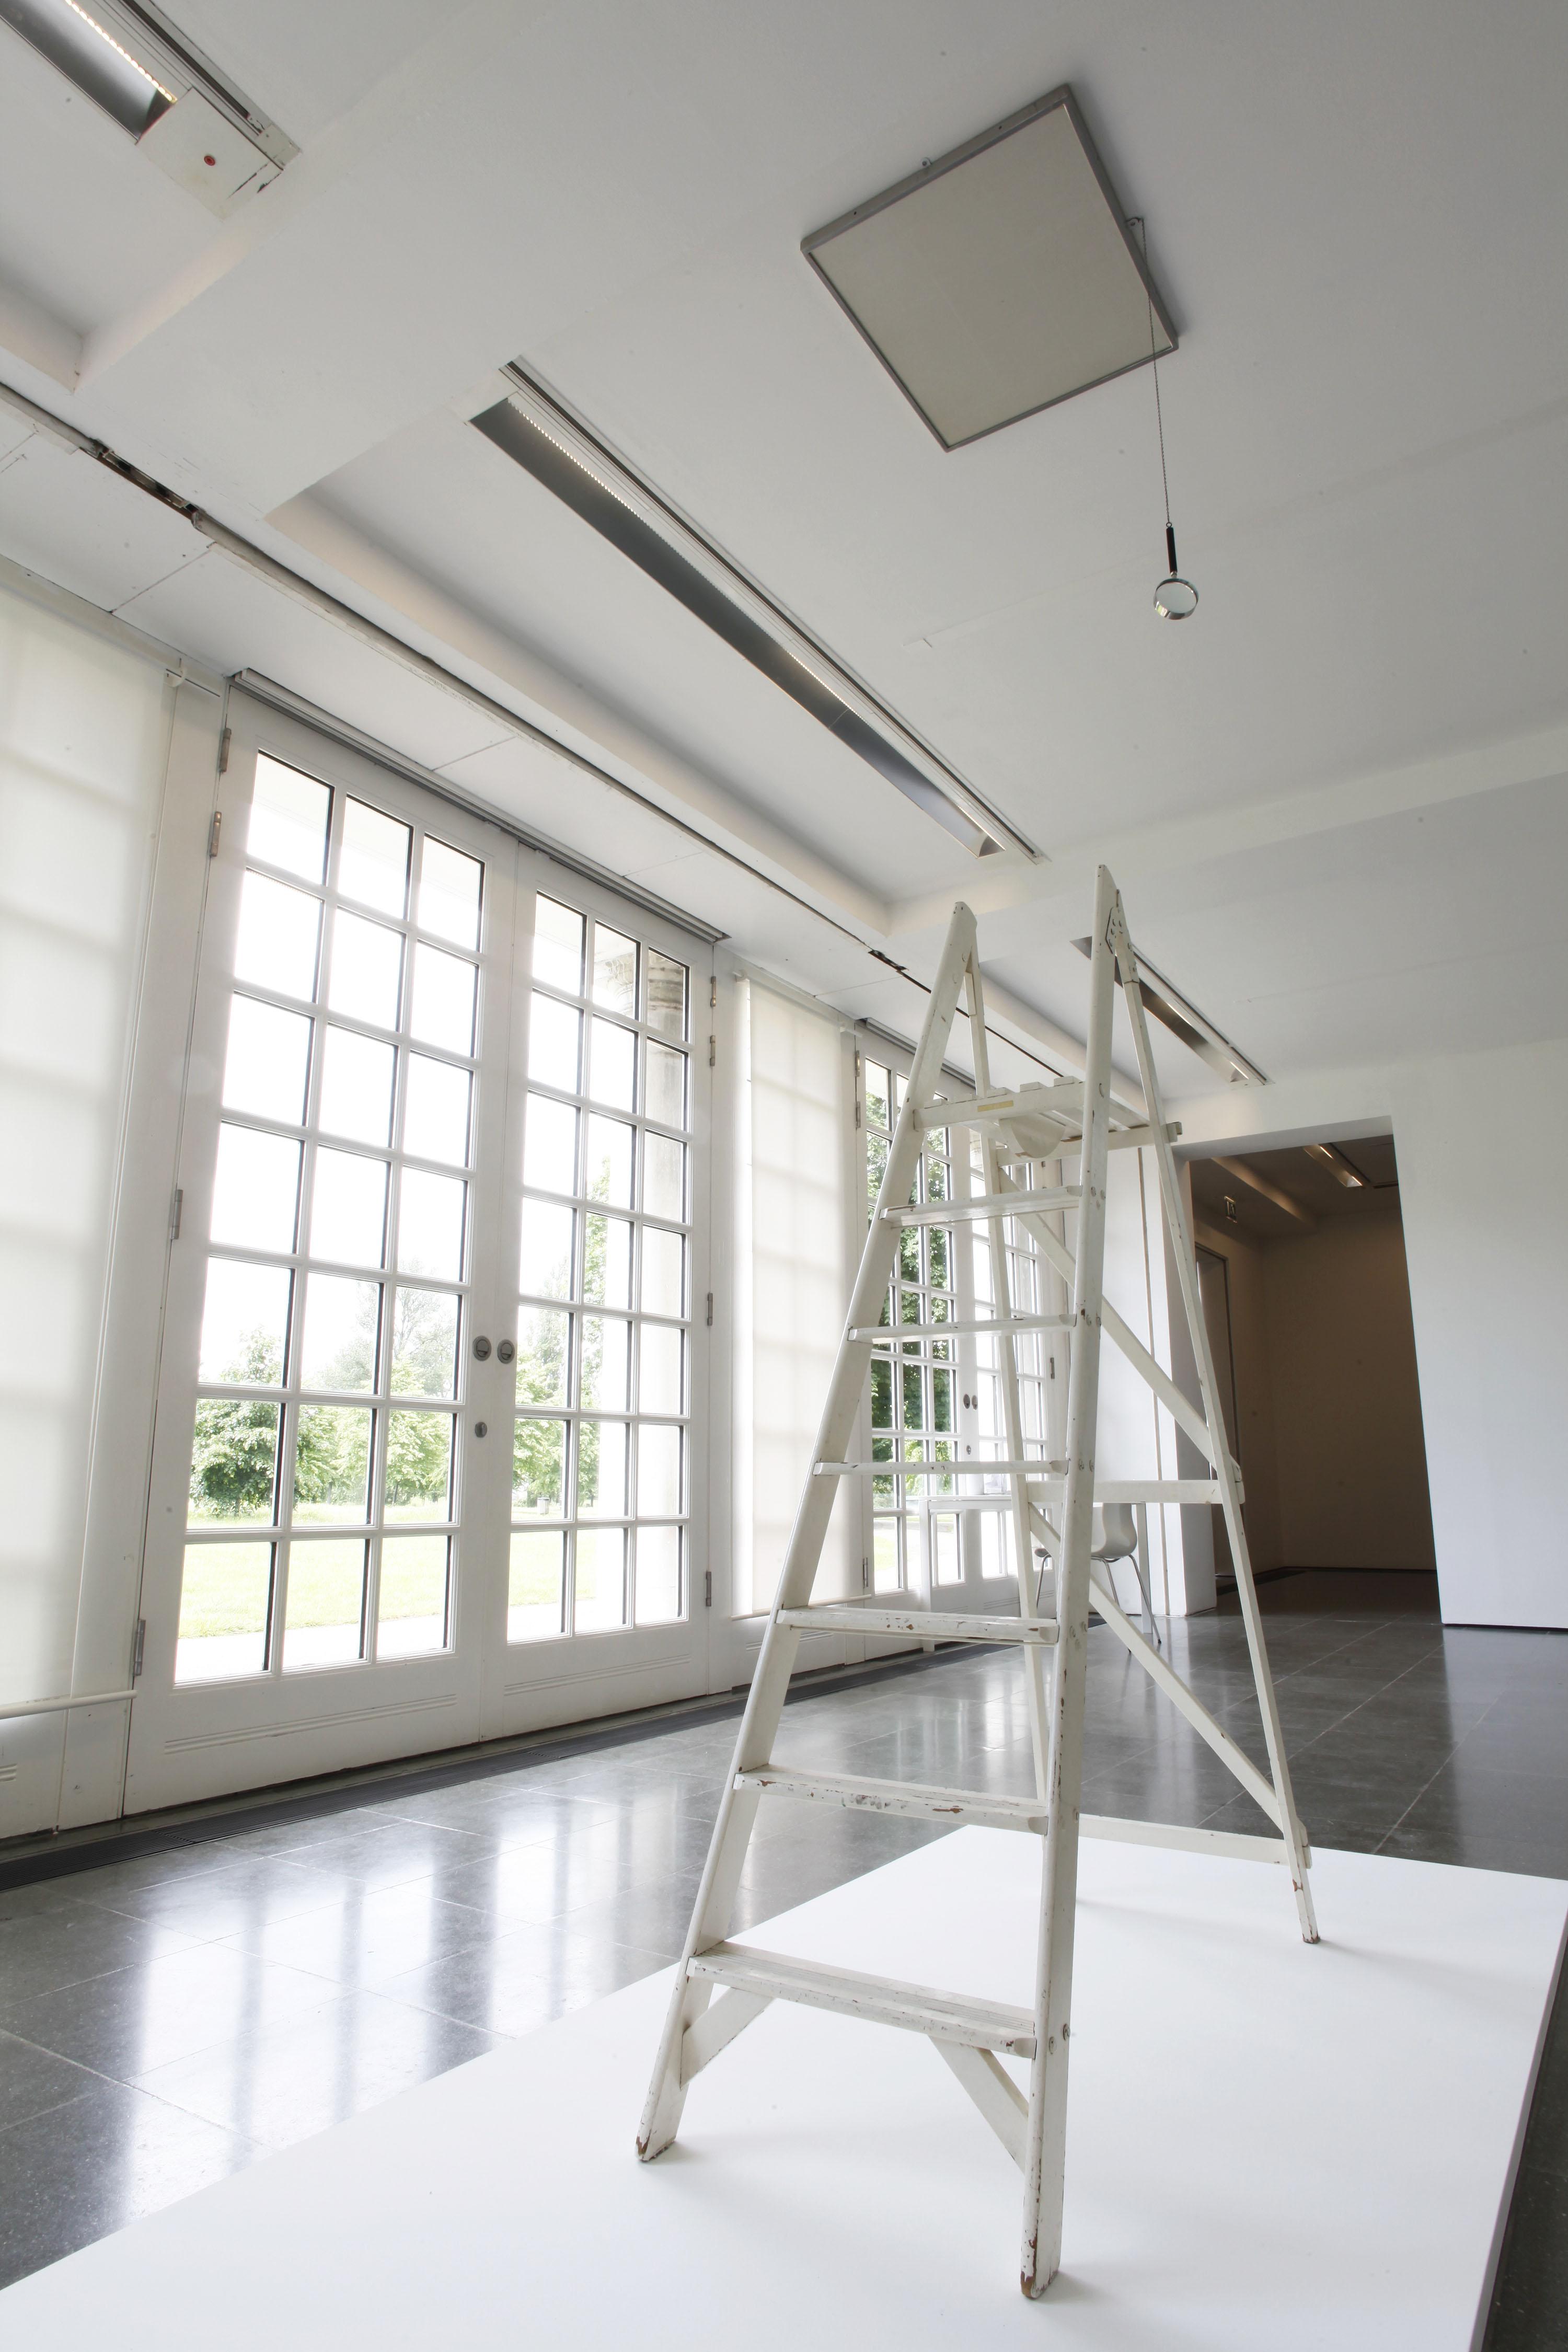 Yoko Ono - To The Light (Installation View), Serpentine Gallery